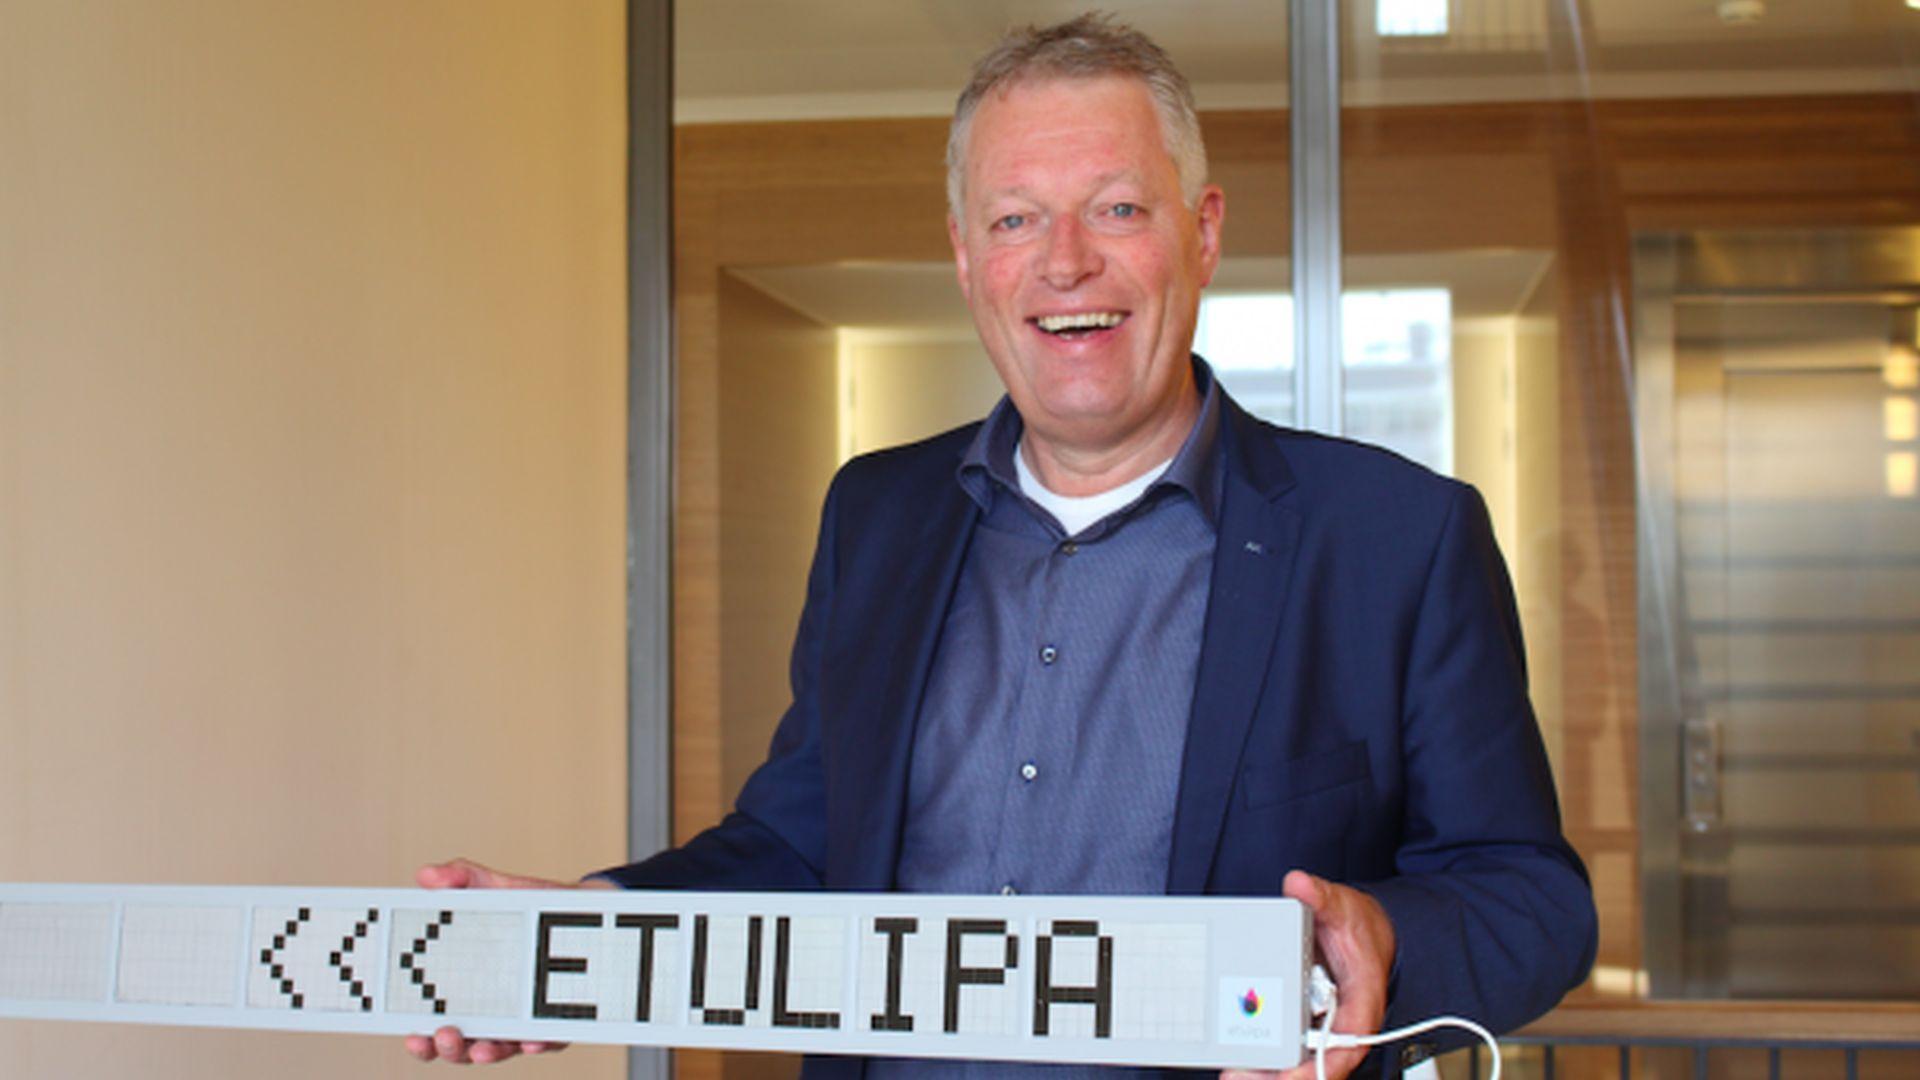 Gerard & Anton Awards: Etulipa, electronic billboards without light pollution